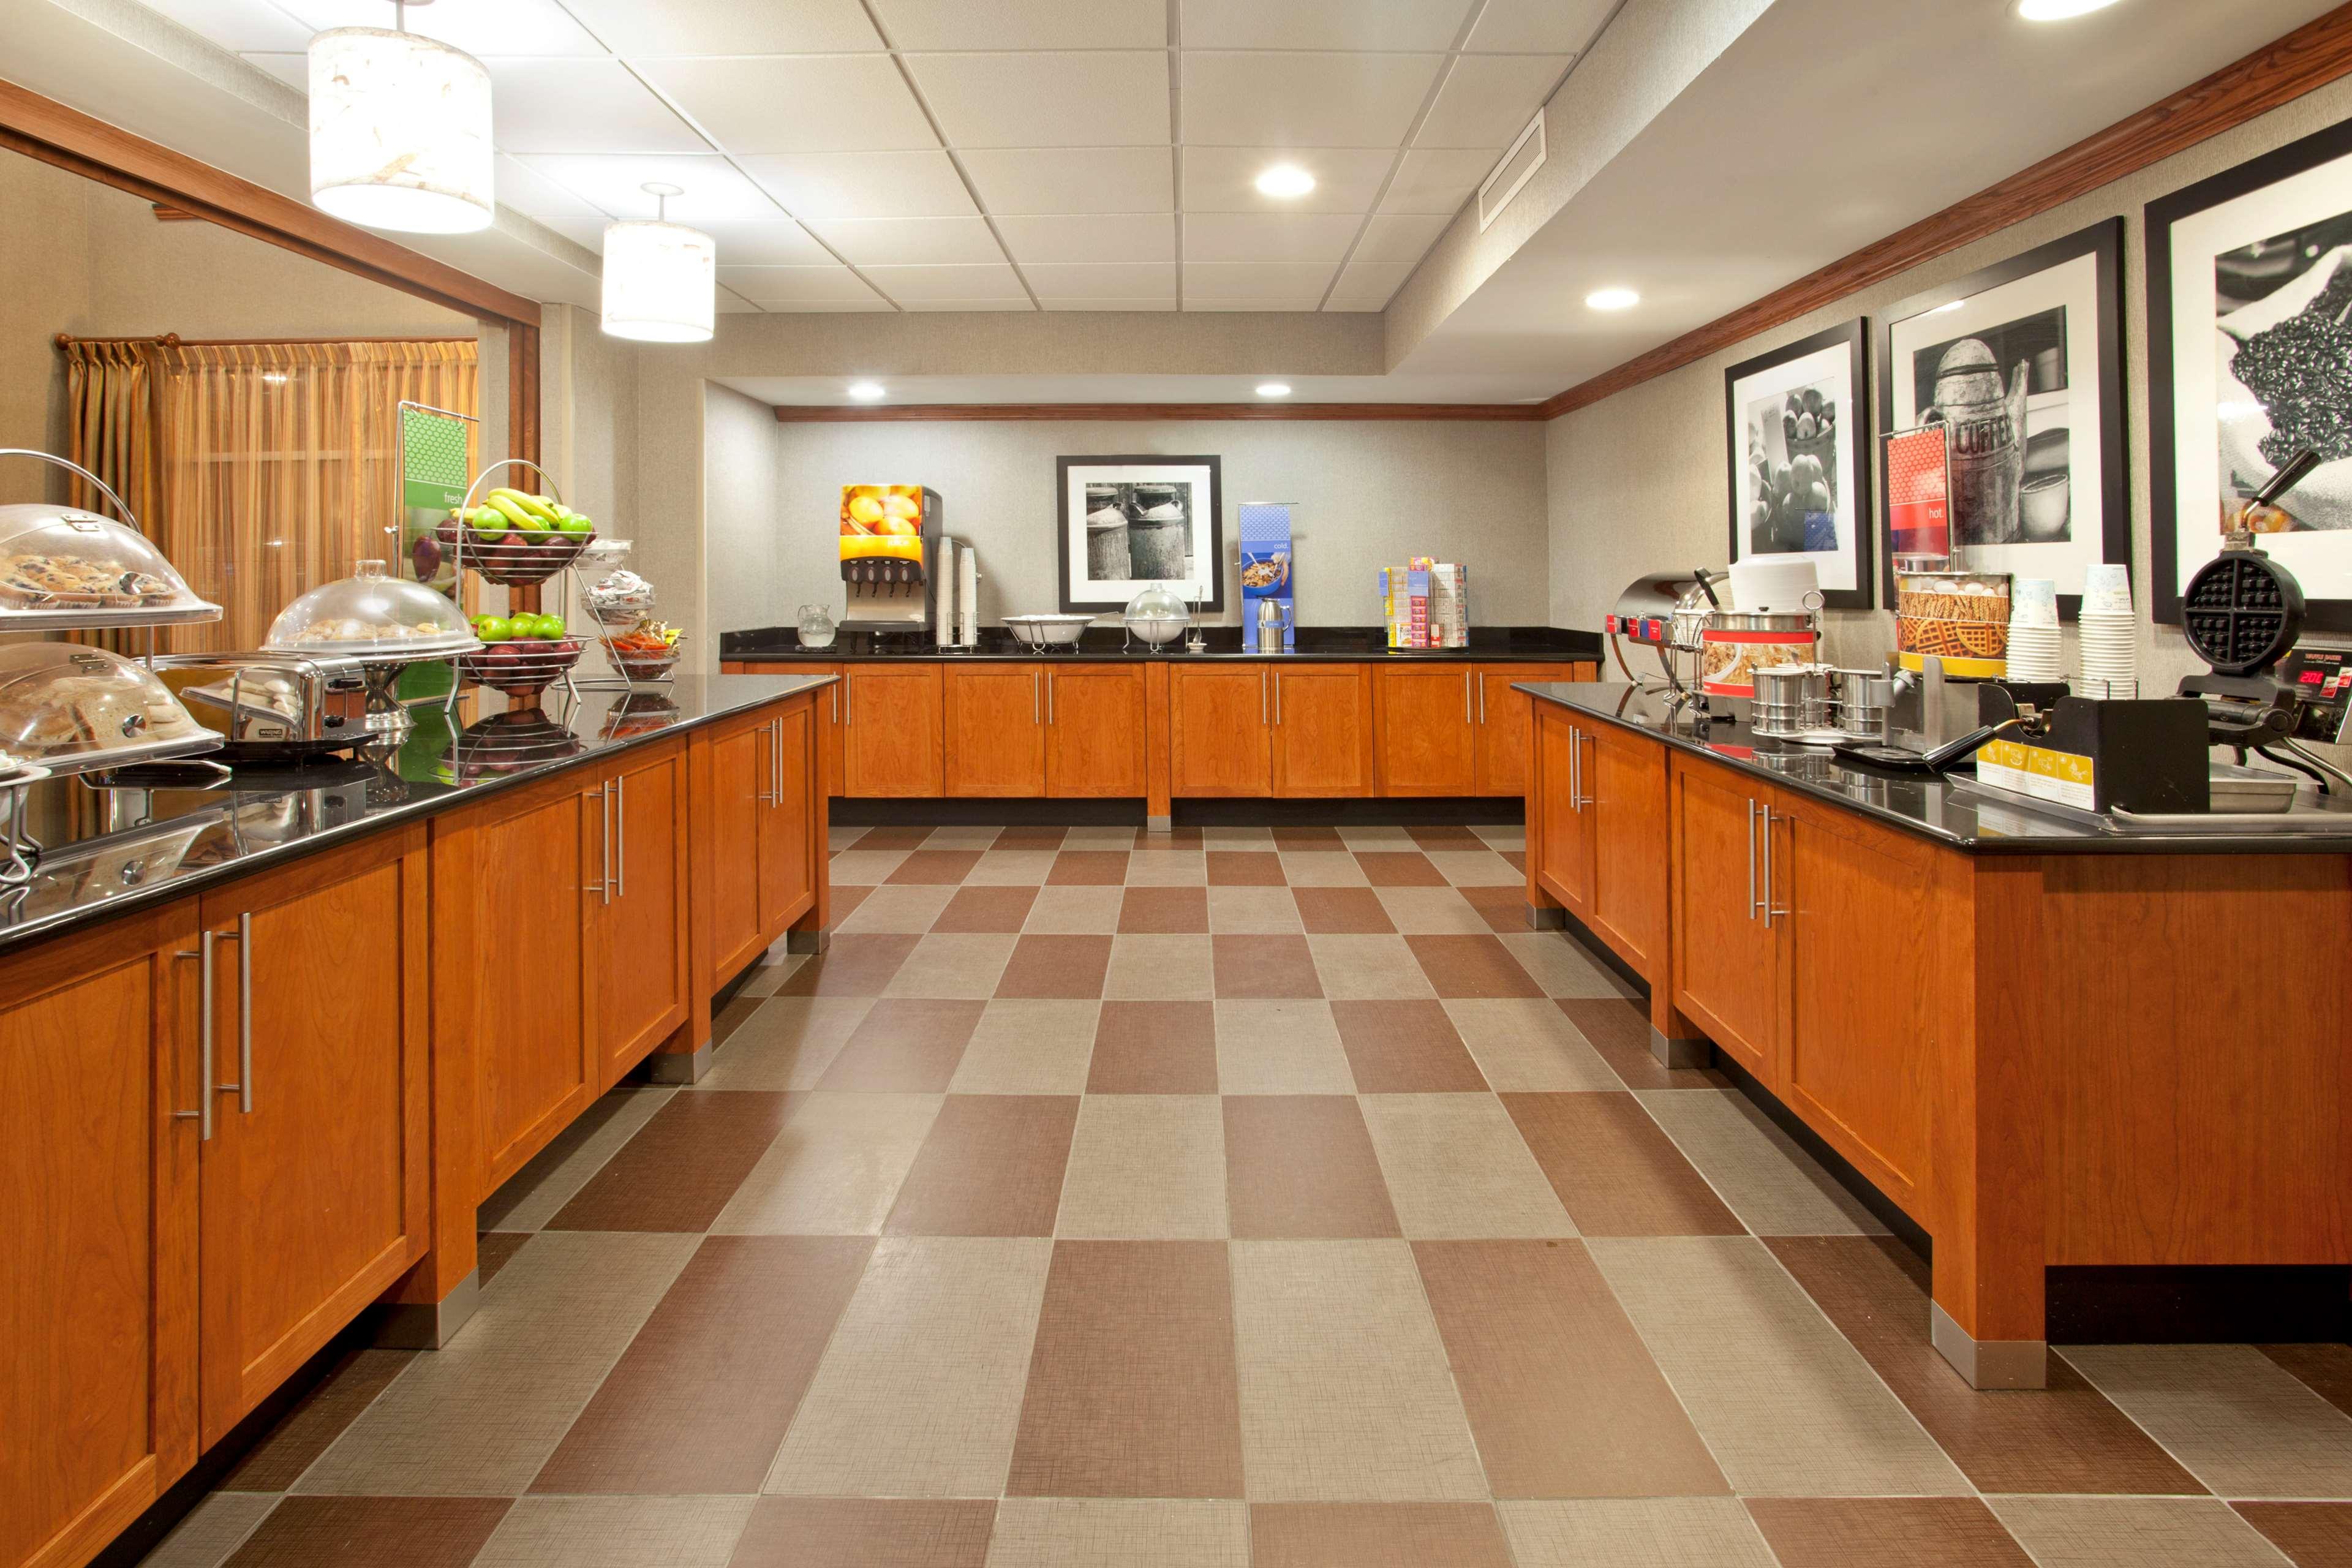 Hampton Inn & Suites Fort Worth-West-I-30 image 7